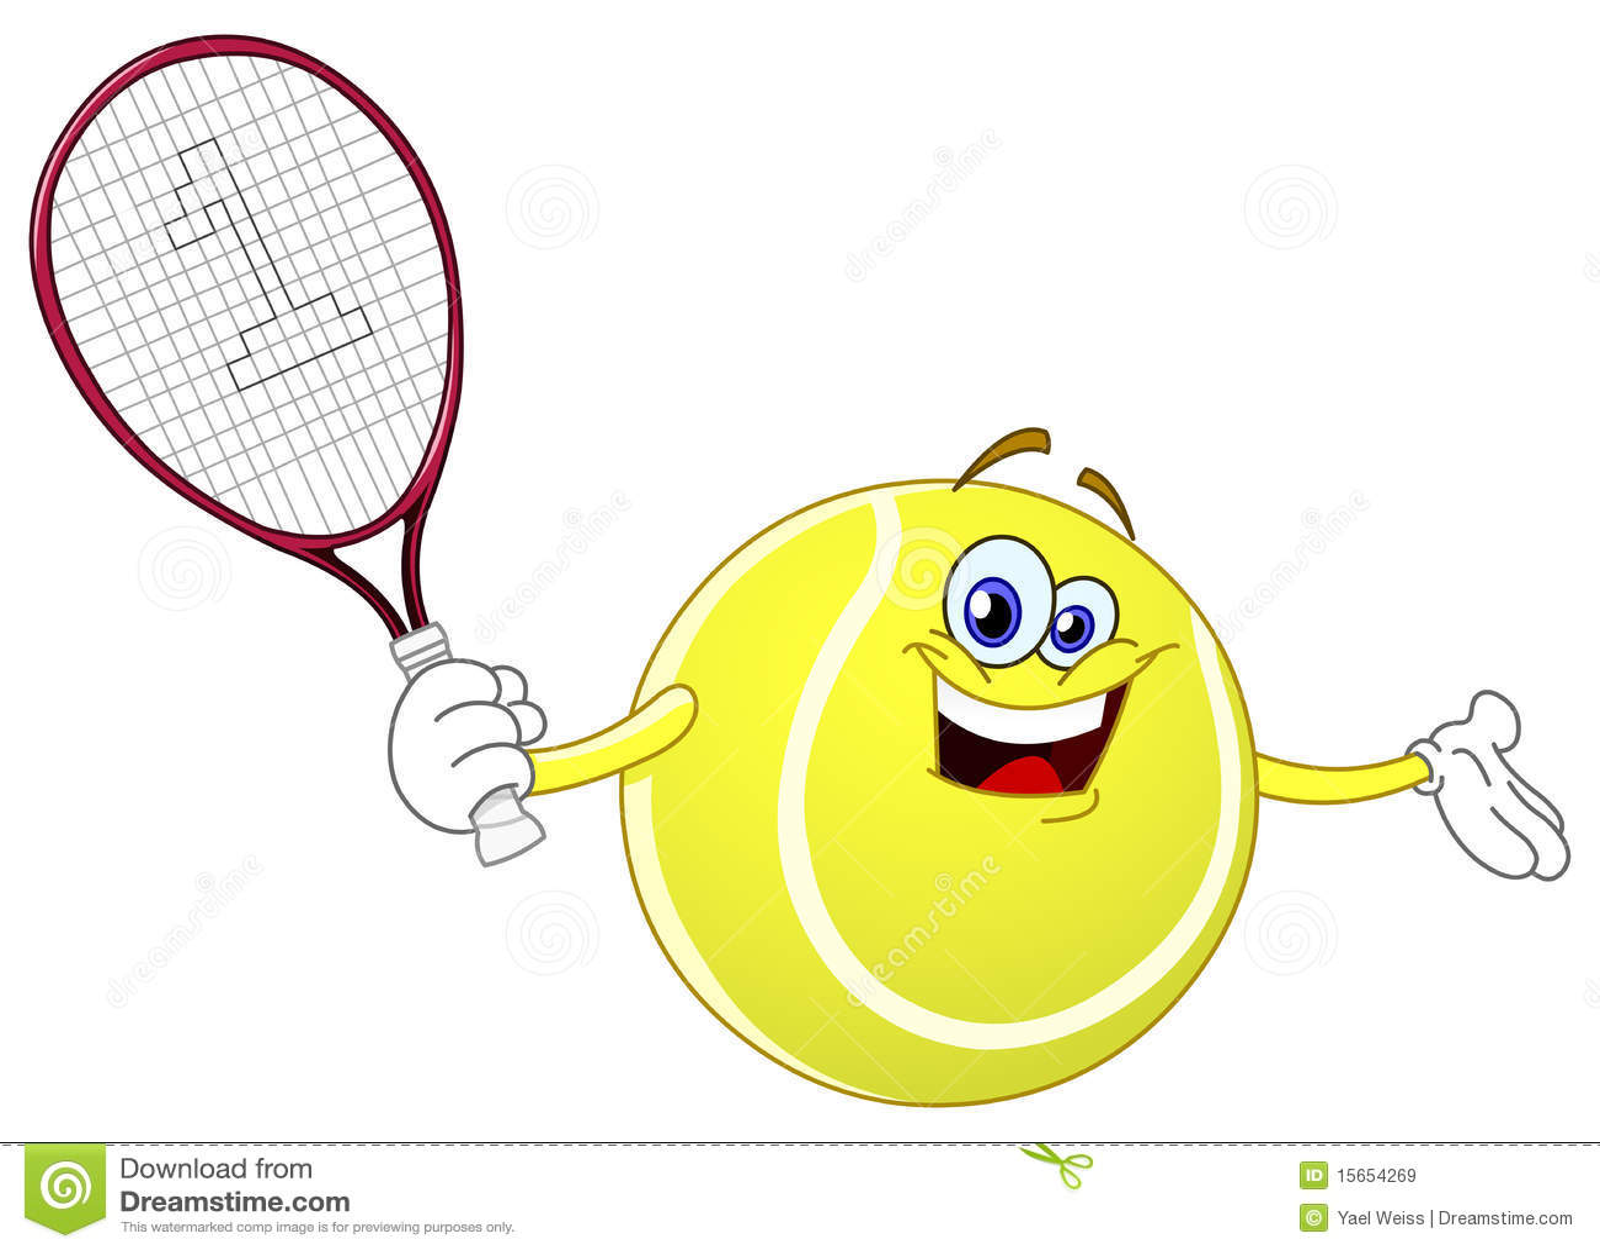 Tennis Ball Stock Vector Illustration Of Ball Object 15654269